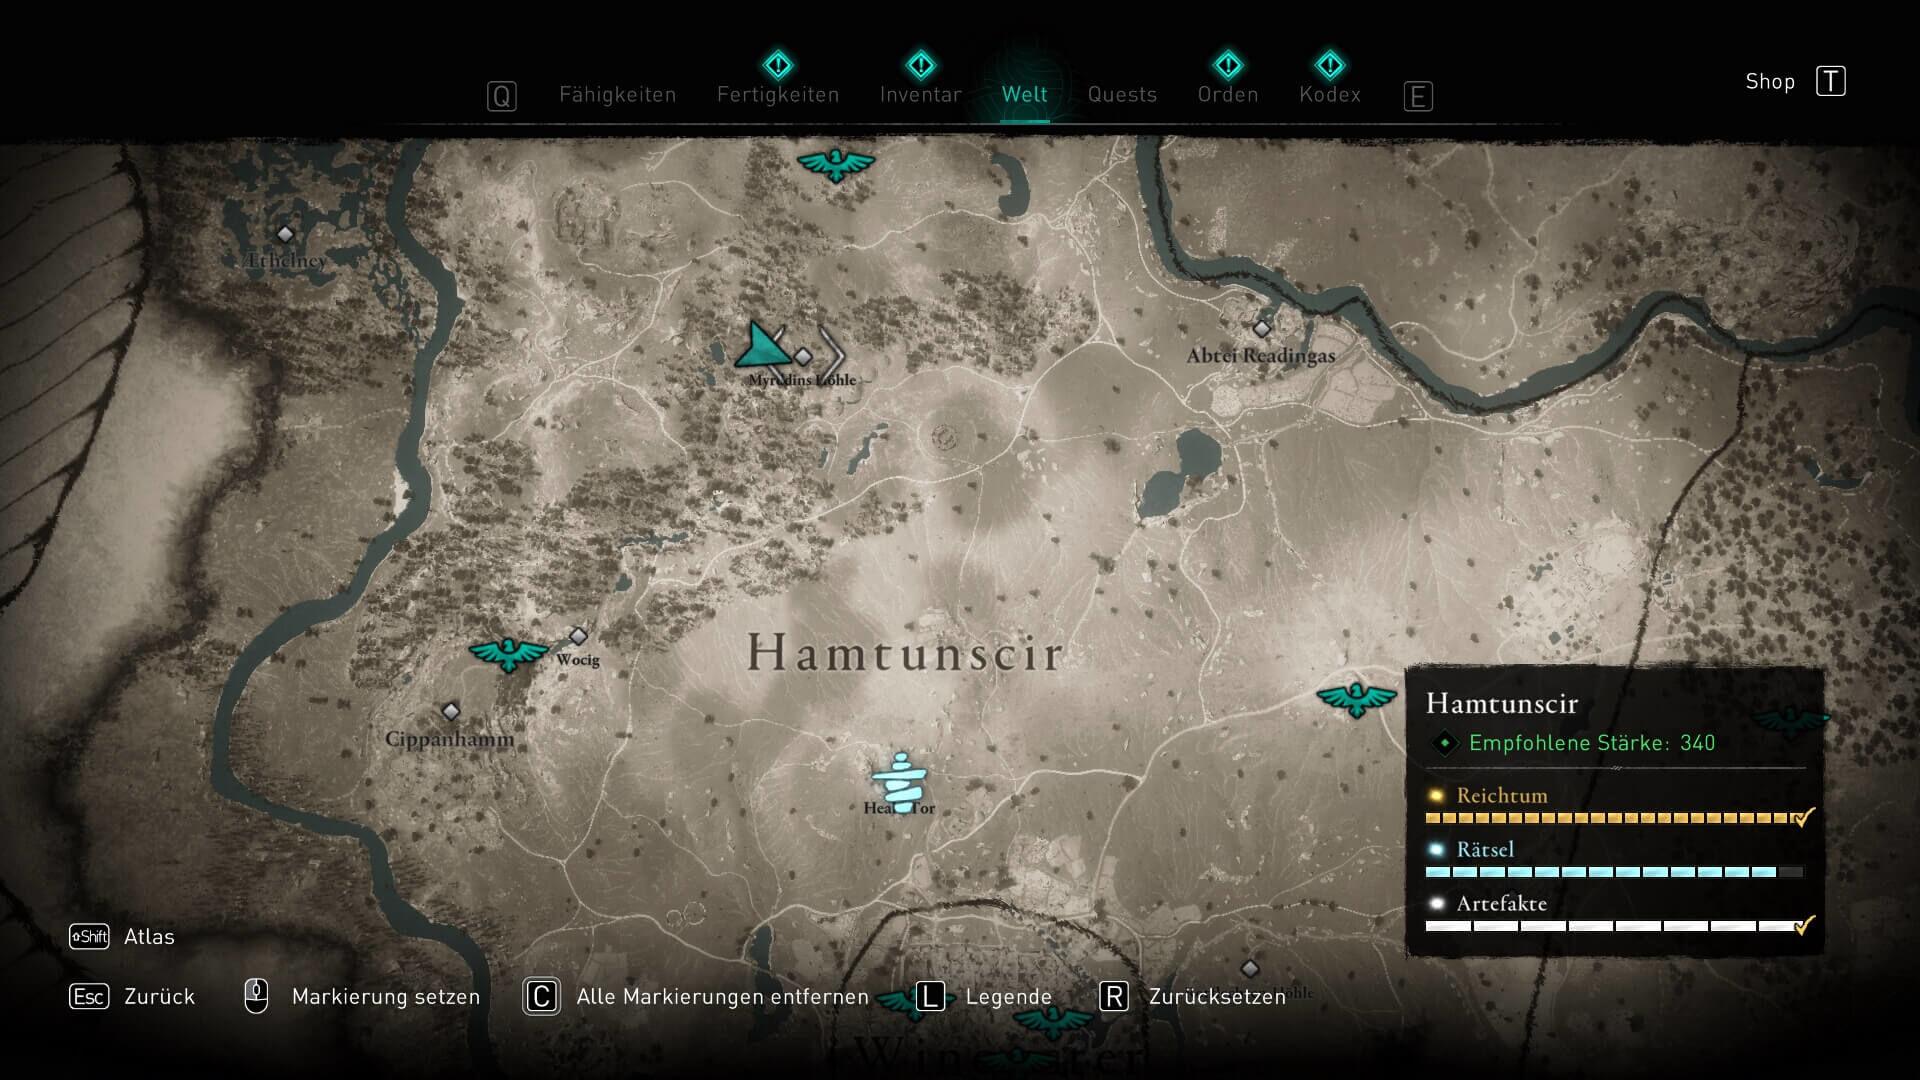 Assassin's Creed Valhalla Fundort Excalibur Karte